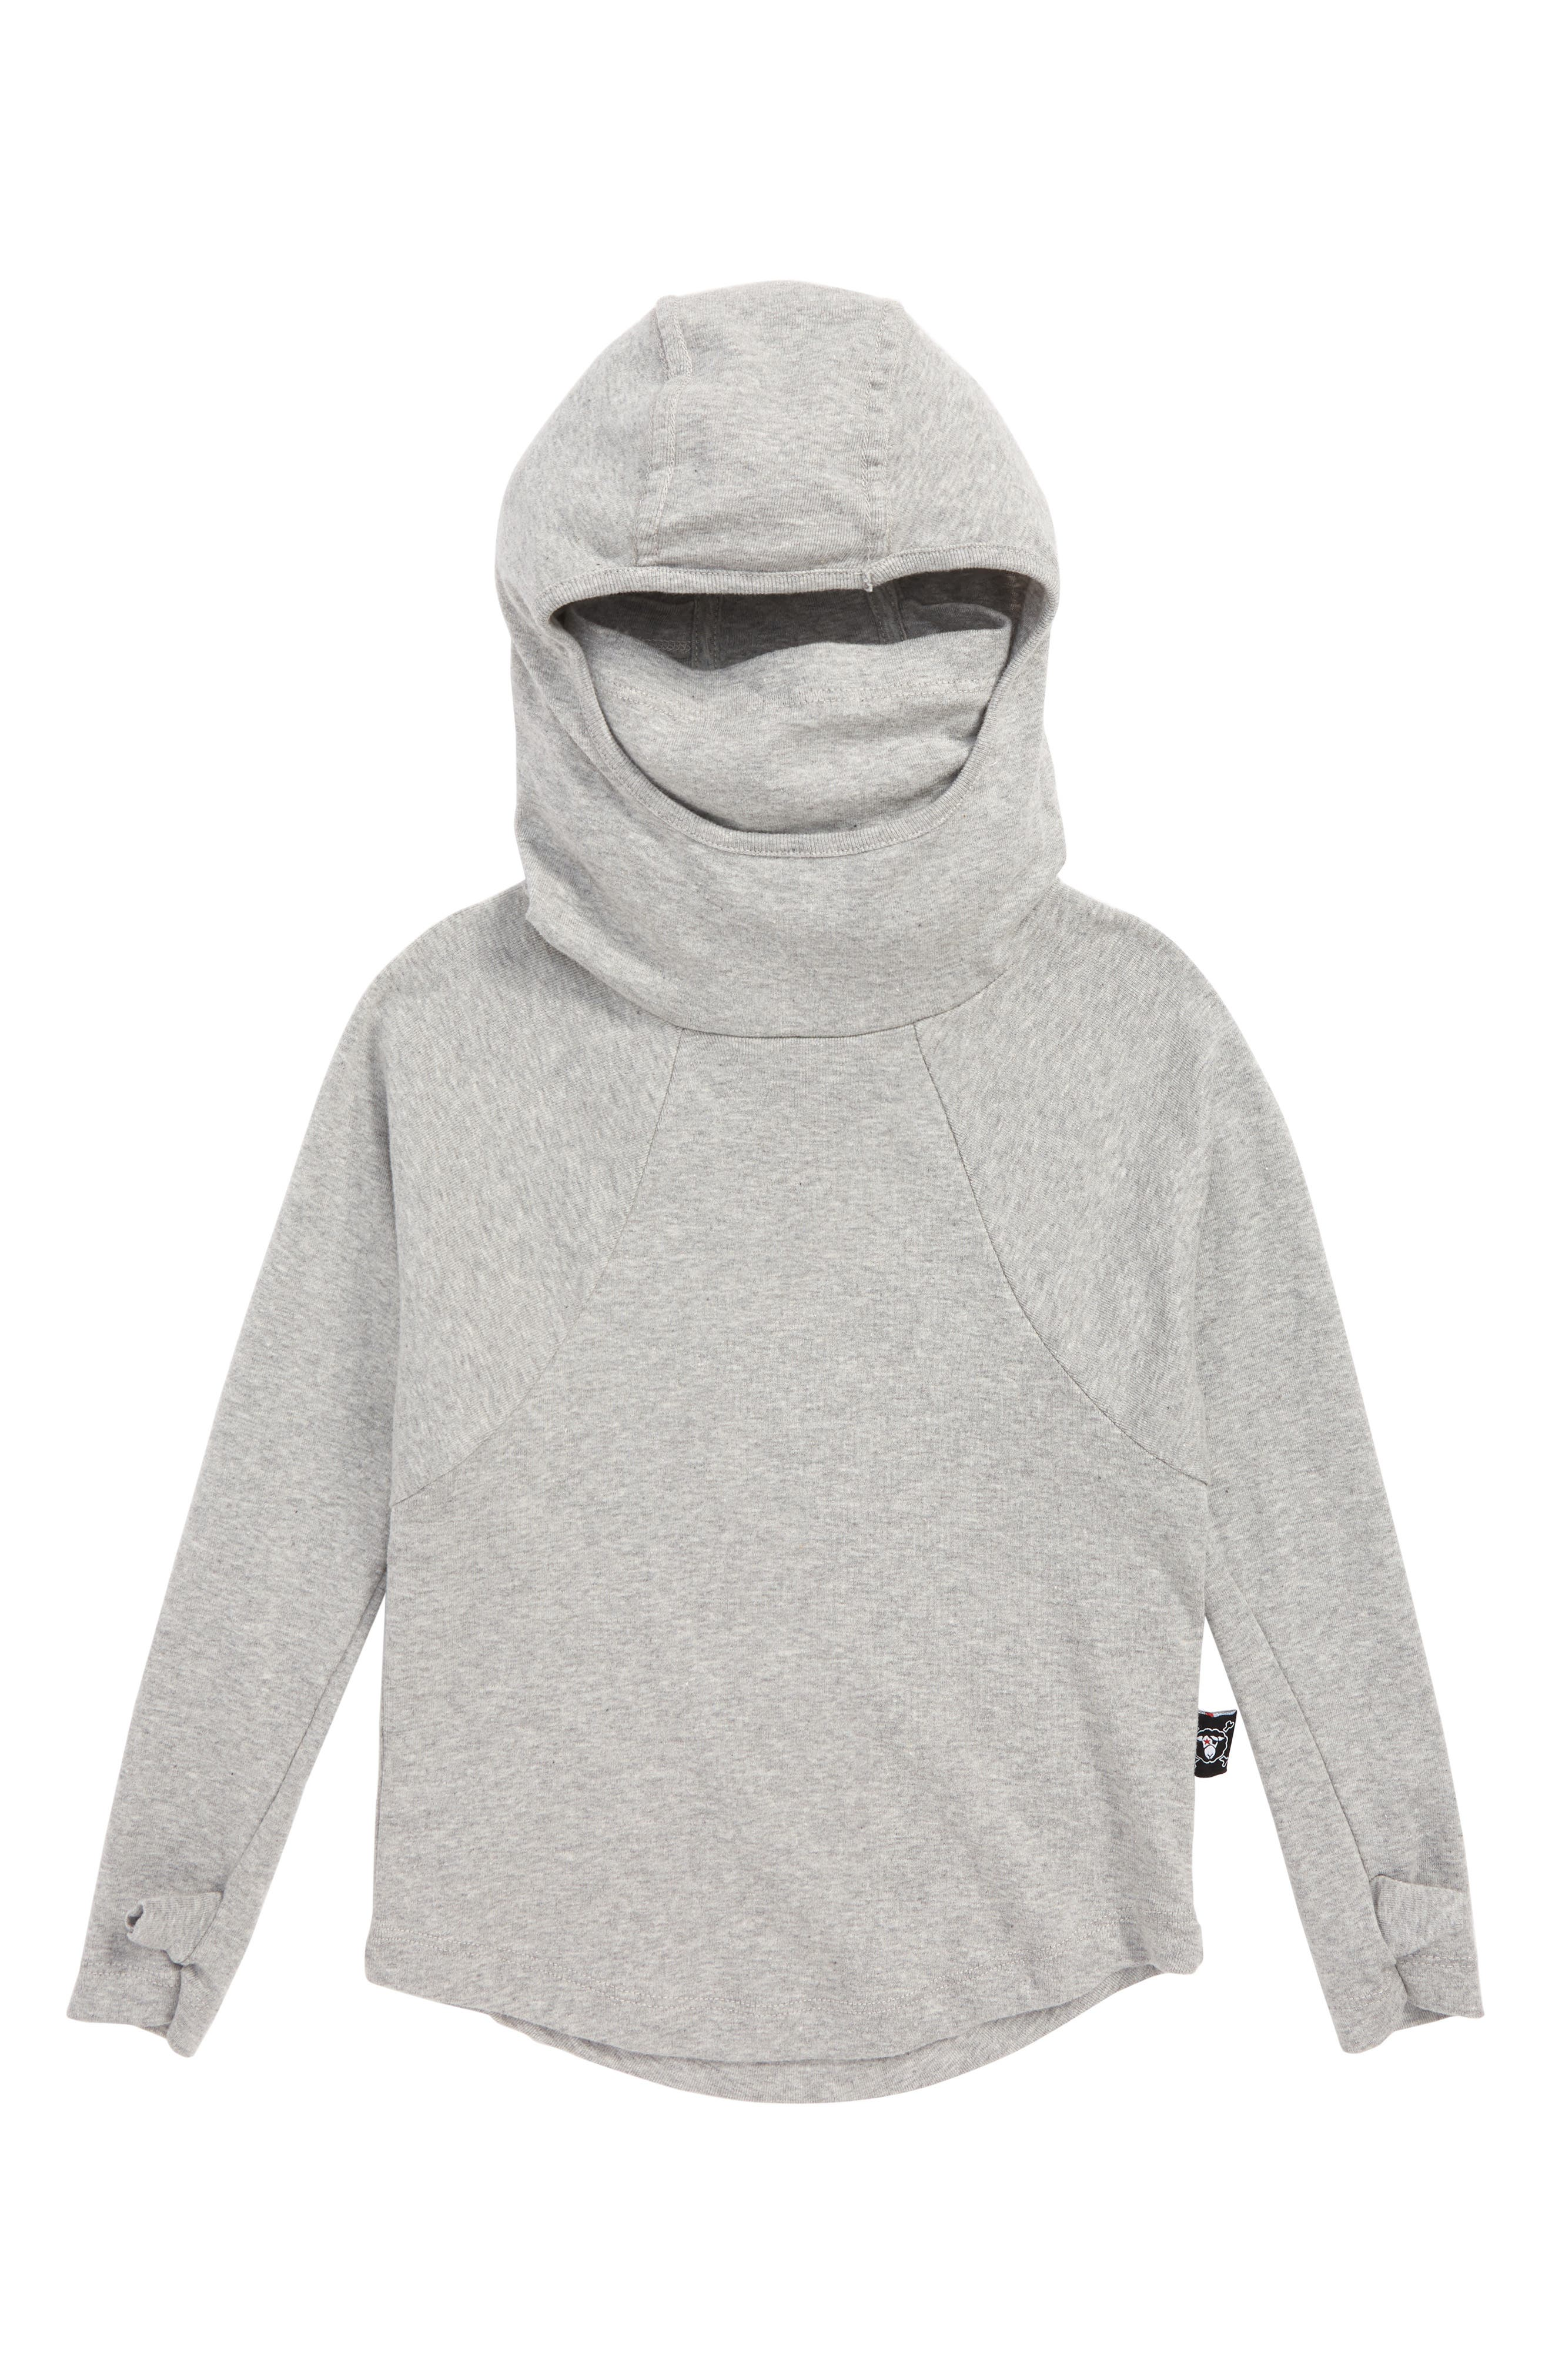 Ninja Hooded Shirt,                         Main,                         color, HEATHER GREY